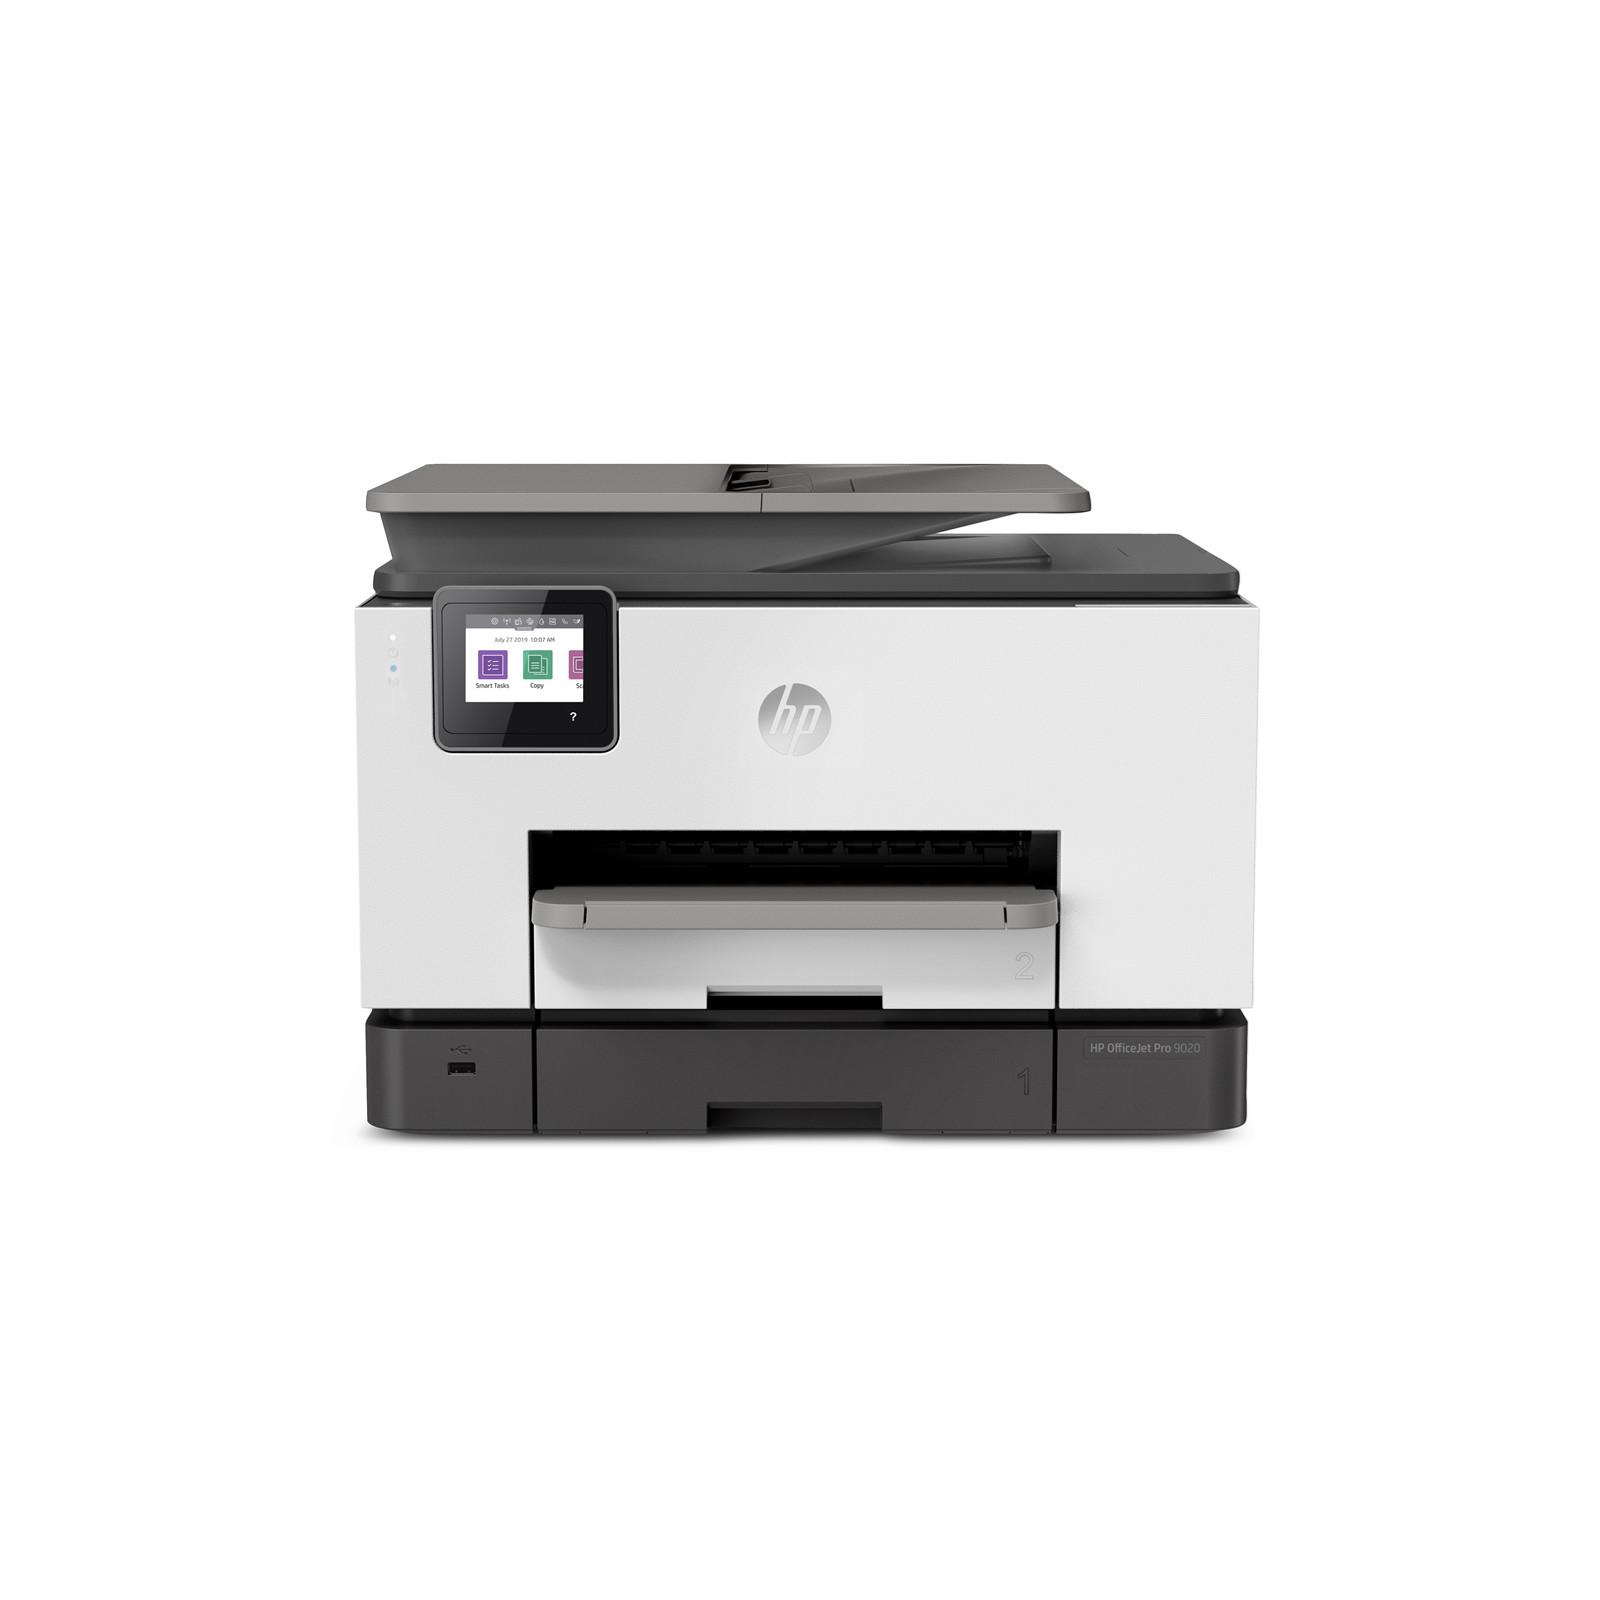 HP Officejet Pro 9020 e-AiO